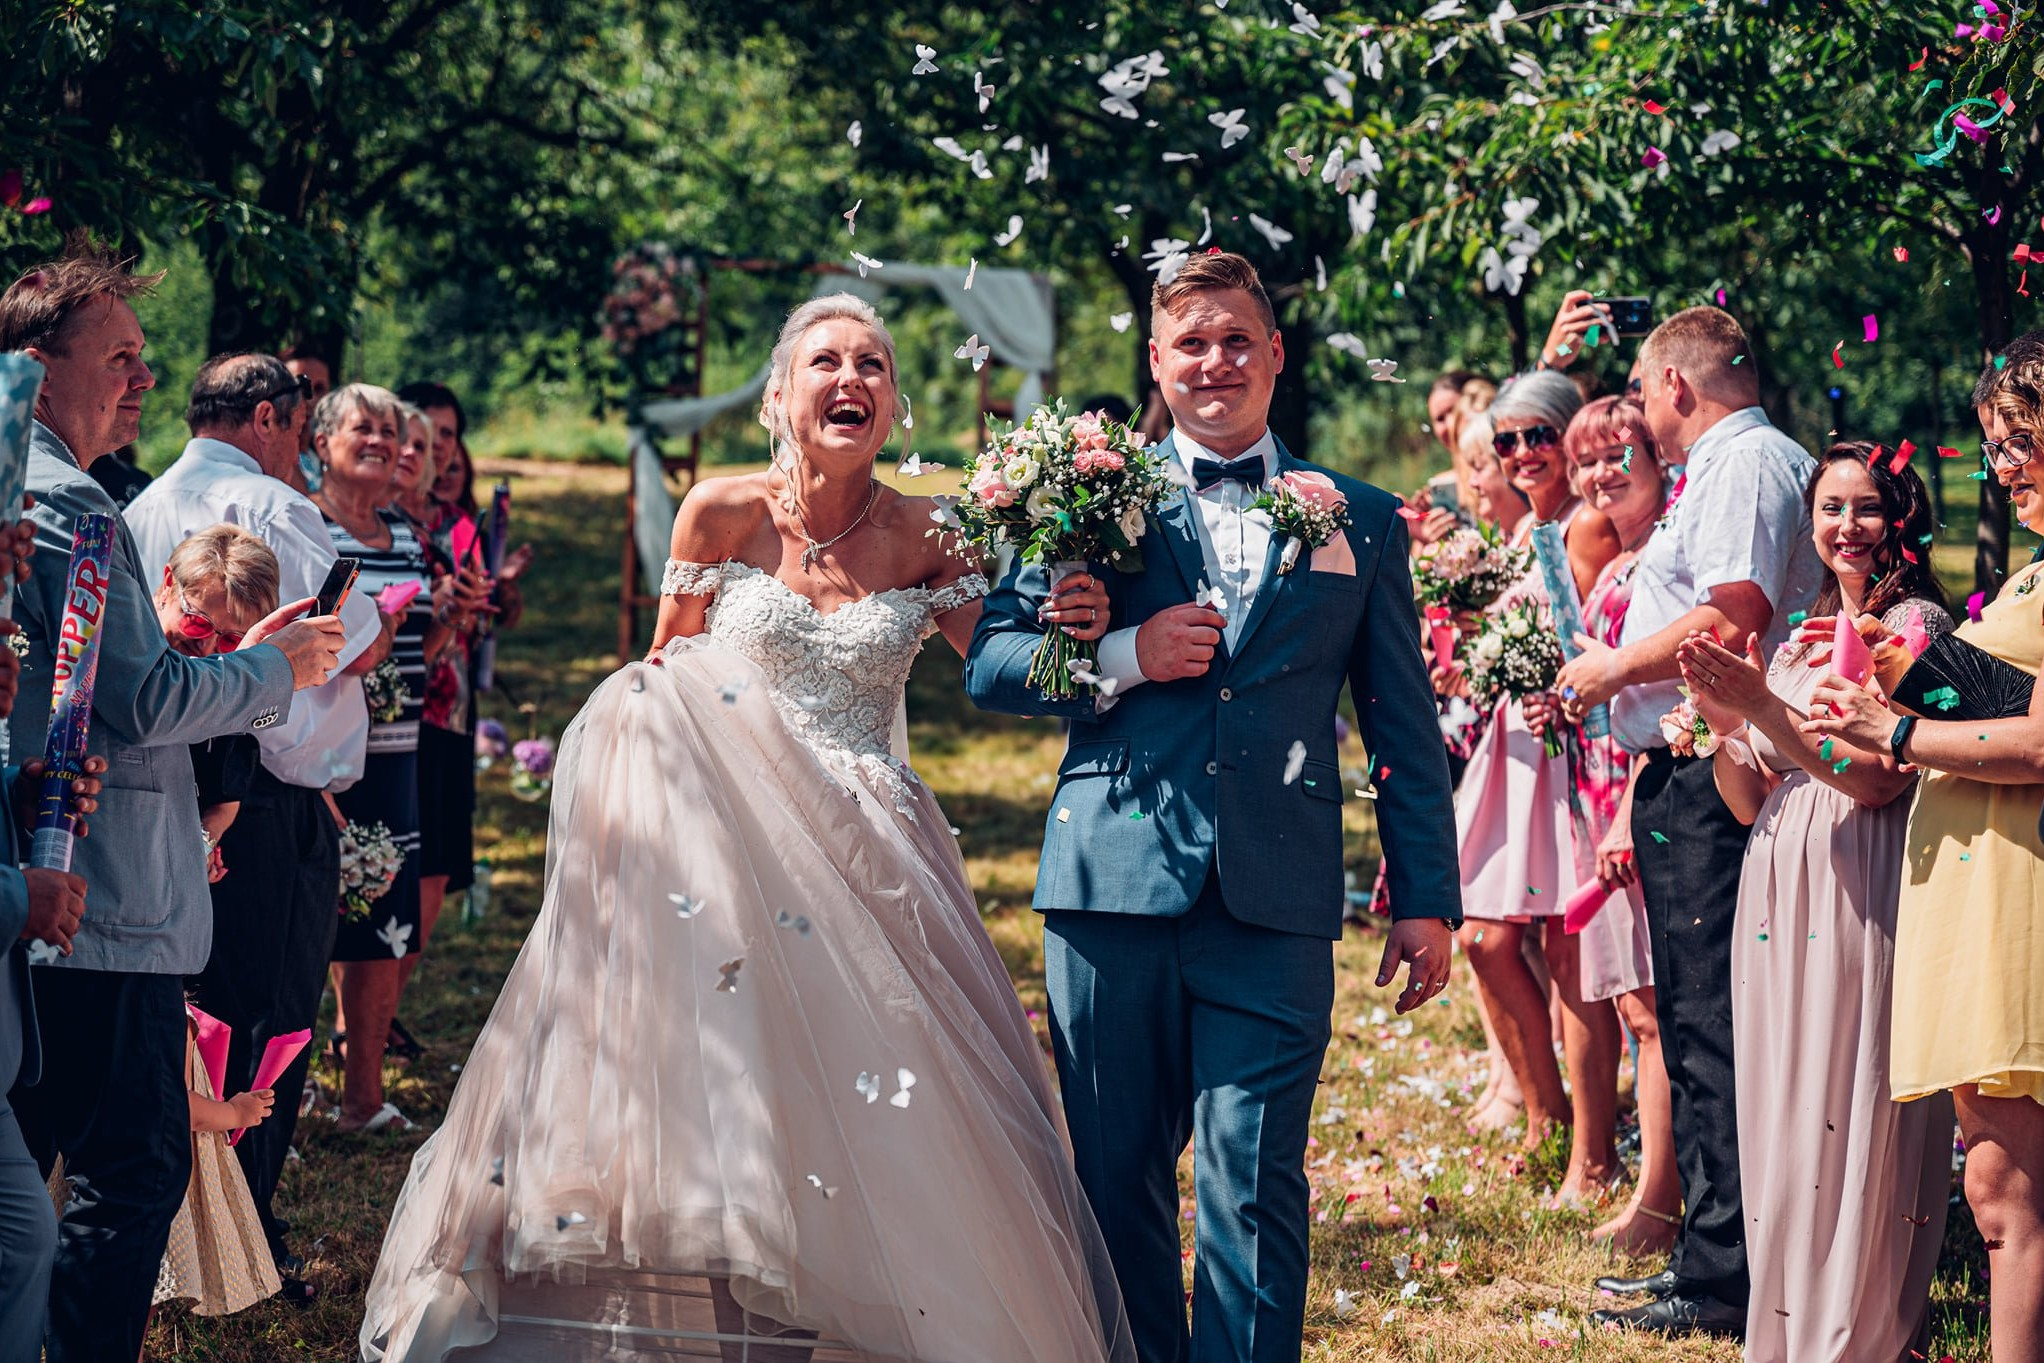 svatba zebín, svatba na zebíně, svatba jičín, svatební focení jičín, svatební fotograf jičín